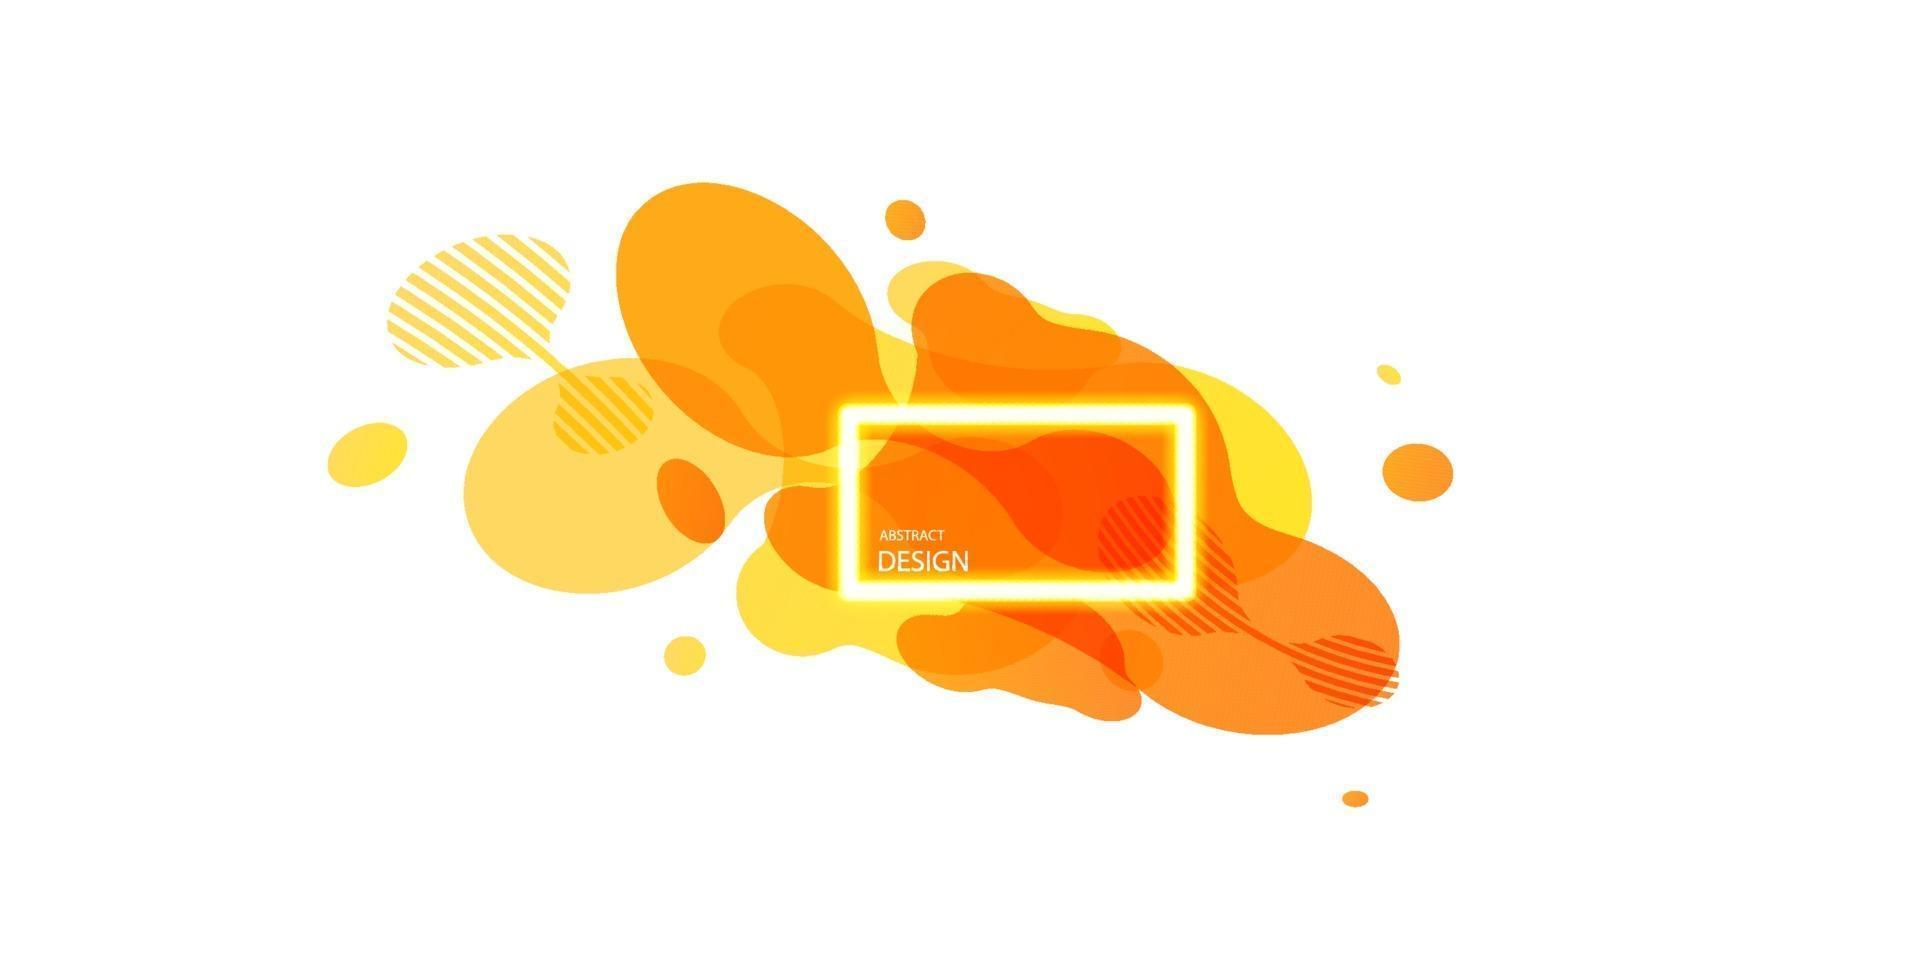 abstrakta geometriska former. flytande gradient banners isolerad på vit bakgrund. flytande vektor bakgrund. gradient geometriska banners med flytande flytande former. dynamisk flytande design för logotyp, flygblad eller presentation.